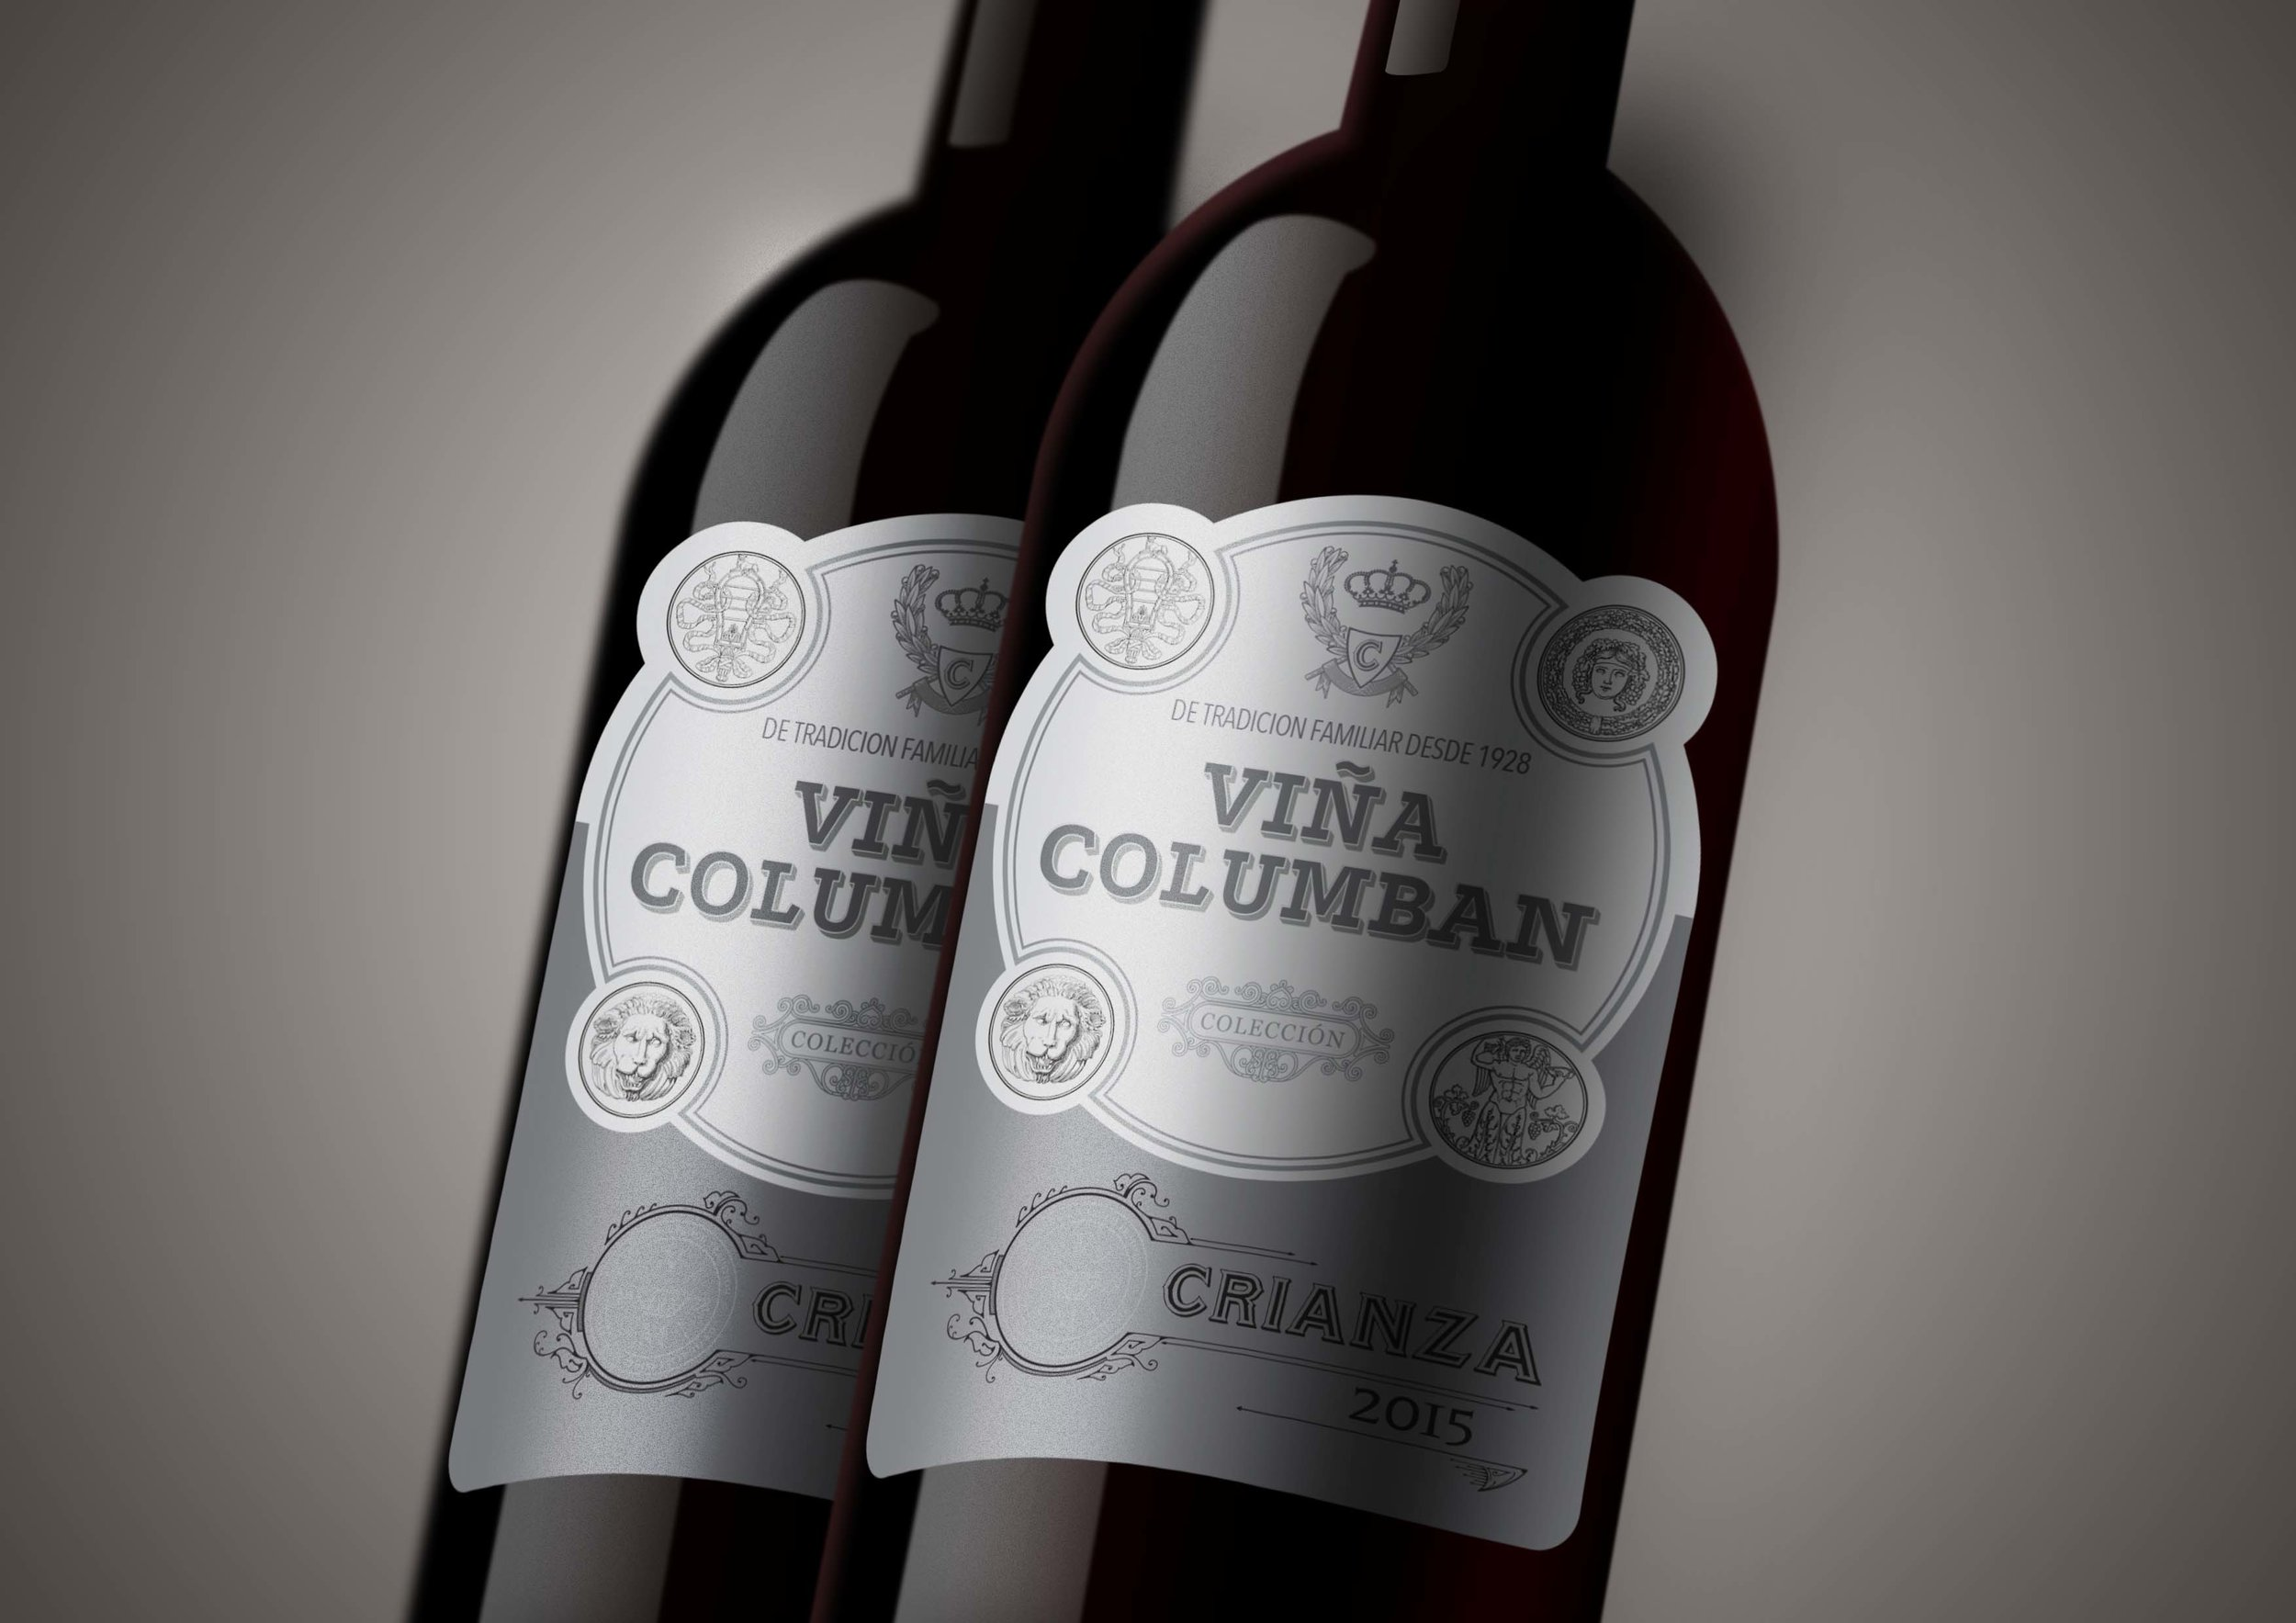 Vina Columban Crianza 2 Bottle Mock Up.jpg